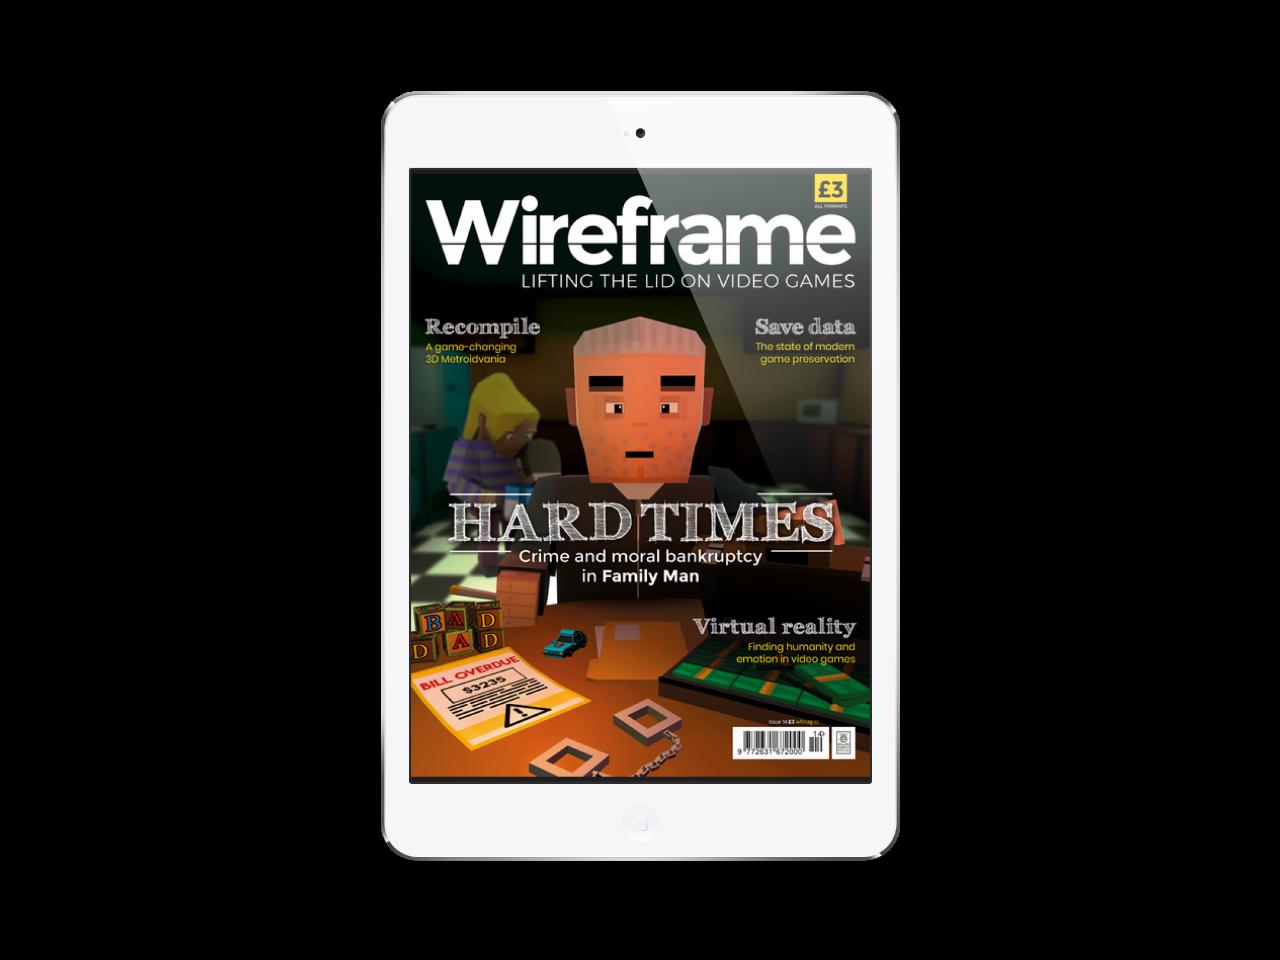 Wireframeマガジン14号タイトル